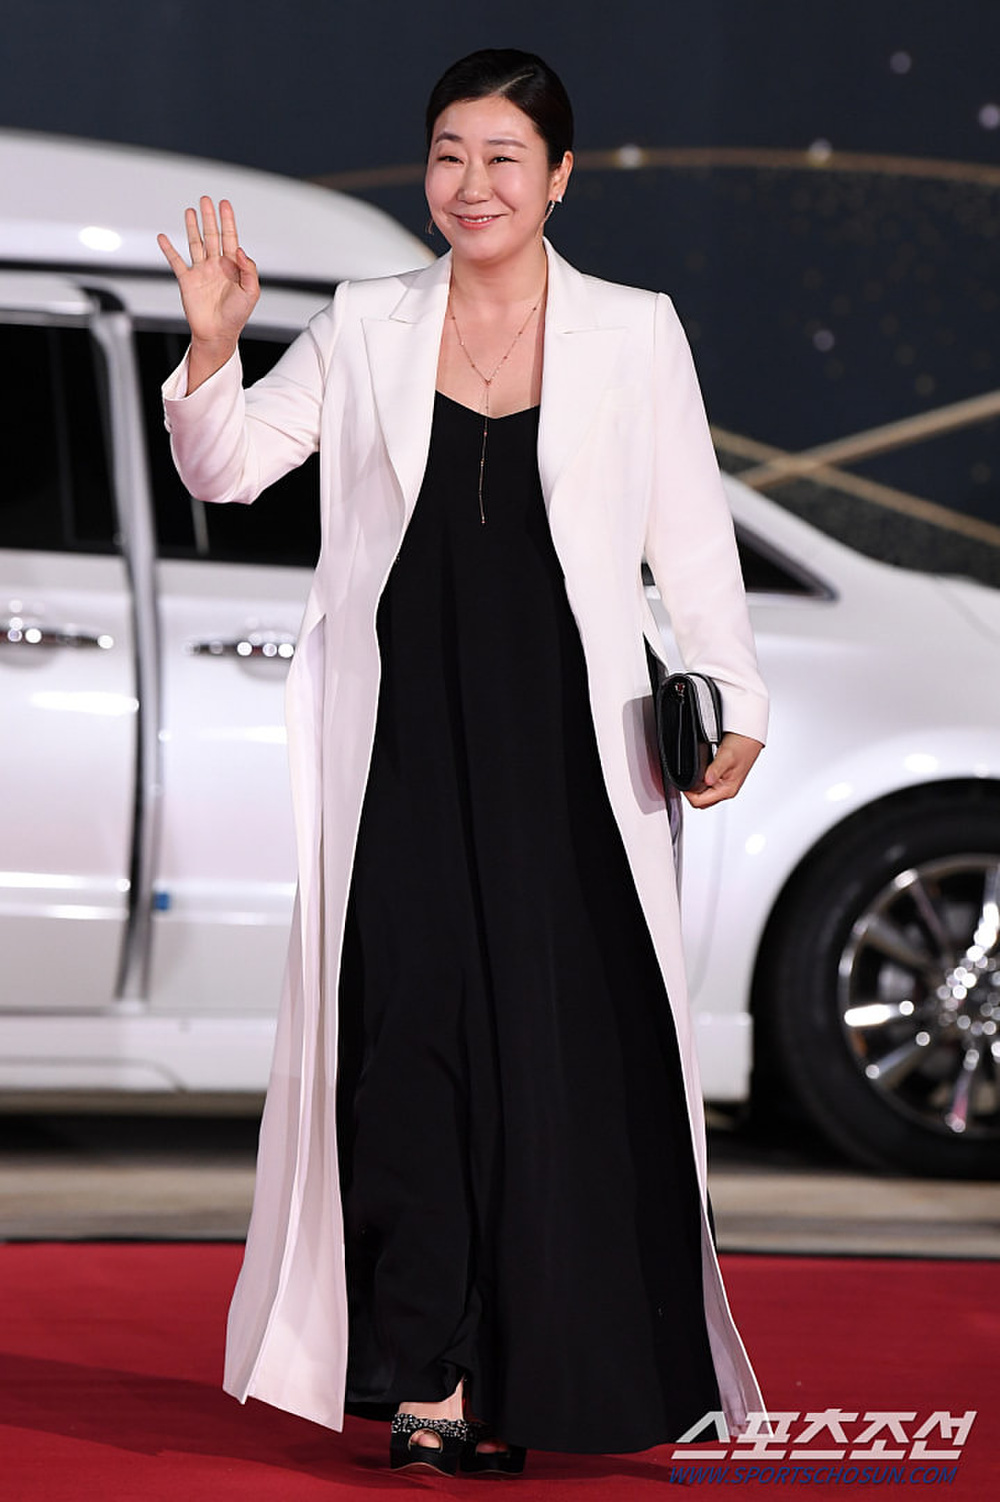 Thảm đỏ 'Rồng xanh 2020': Shin Hye Sun 'cân sắc' Shin Min Ah, Jung Woo Sung - Lee Byung Hun điển trai! Ảnh 2